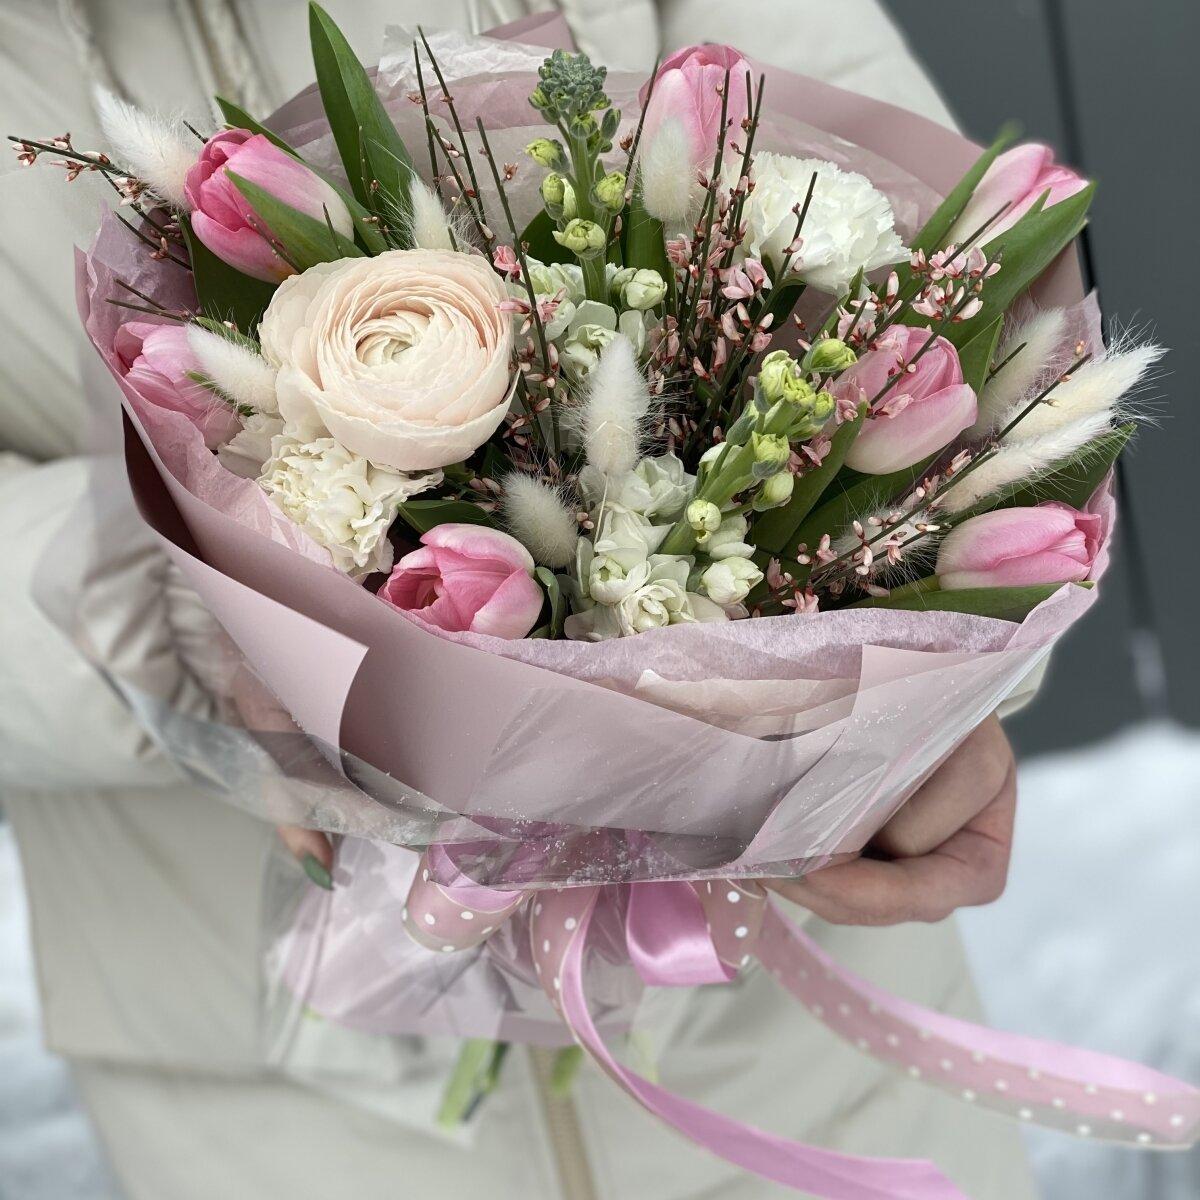 Букет Берген из ранункулюса, тюльпанов, маттиолы, диантуса и генисты